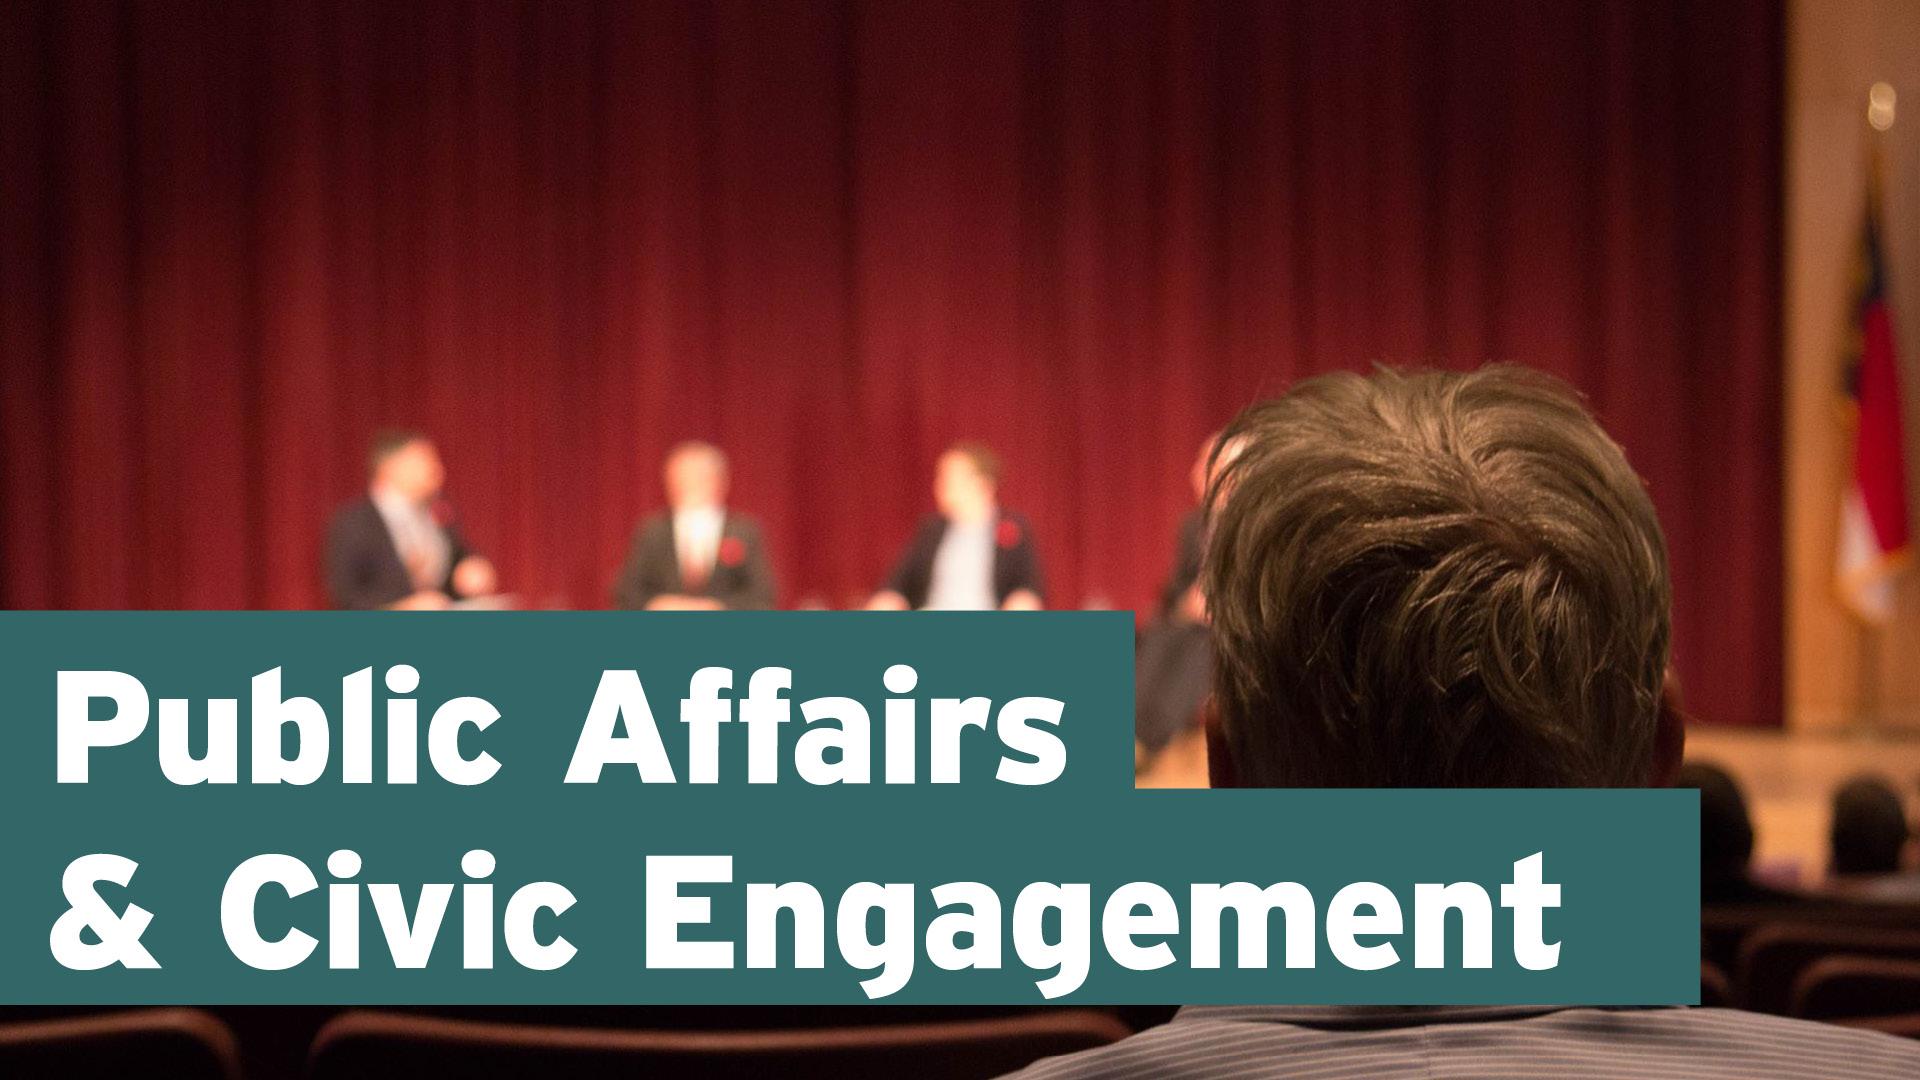 Public Affairs & Civic Engagement